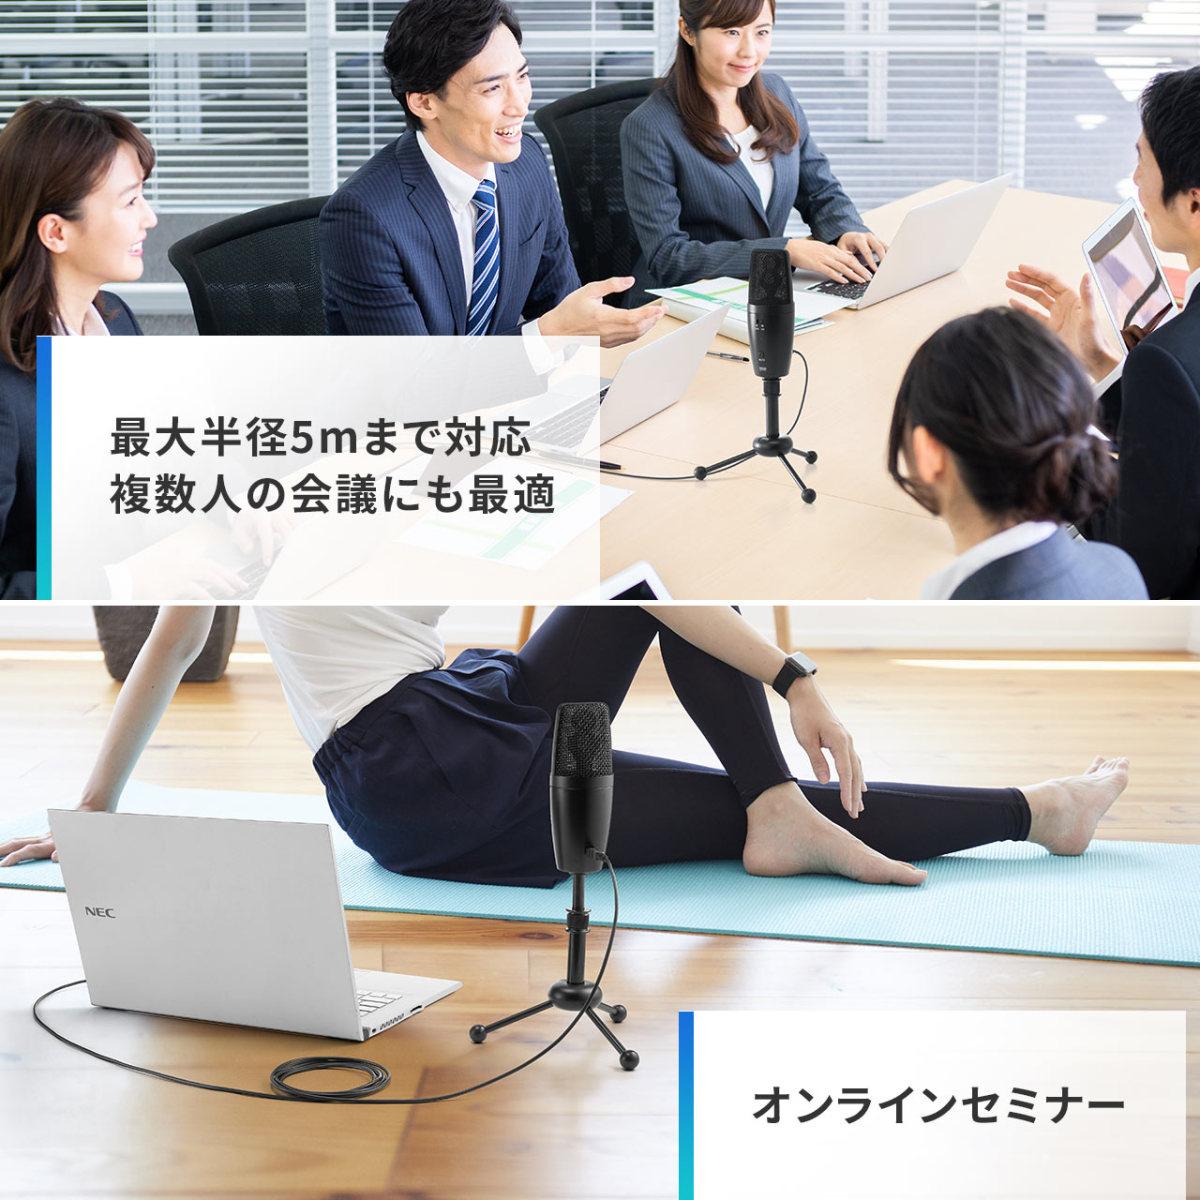 WEB会議マイク 会議 マイク 高集音 WEB会議 USB コンデンサーマイク PC パソコン スタンド式